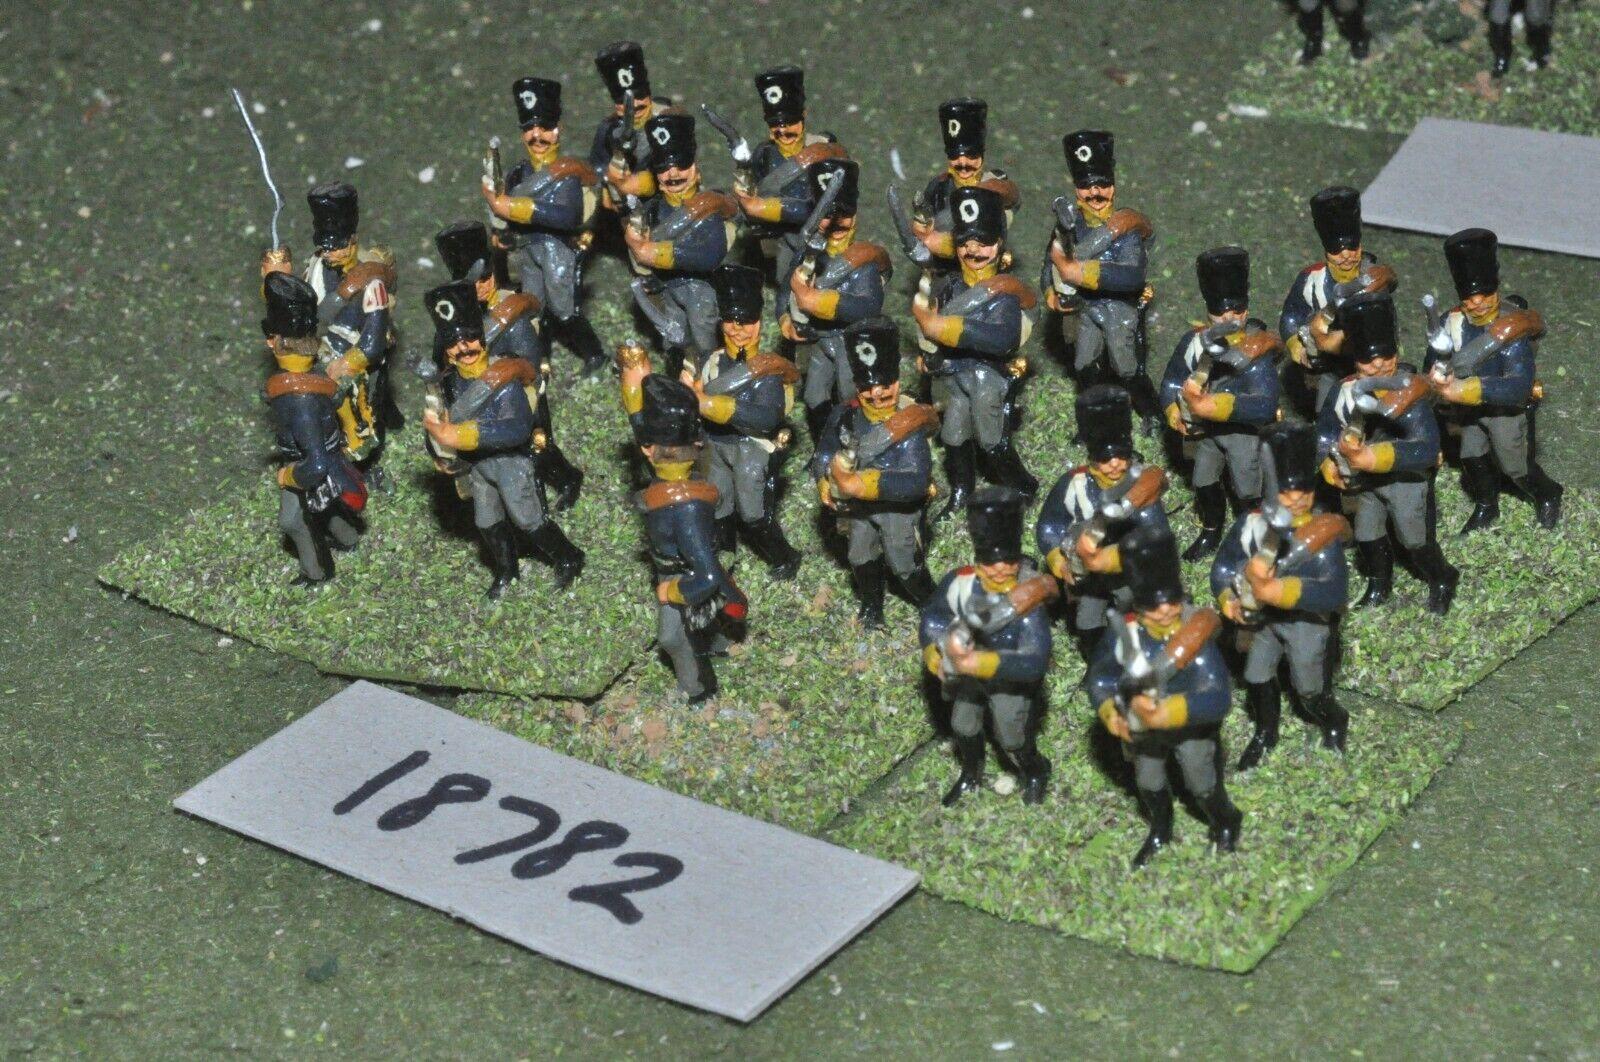 25mm Infantería Napoleónicas Prusia - 24 figuras-INF (18782)